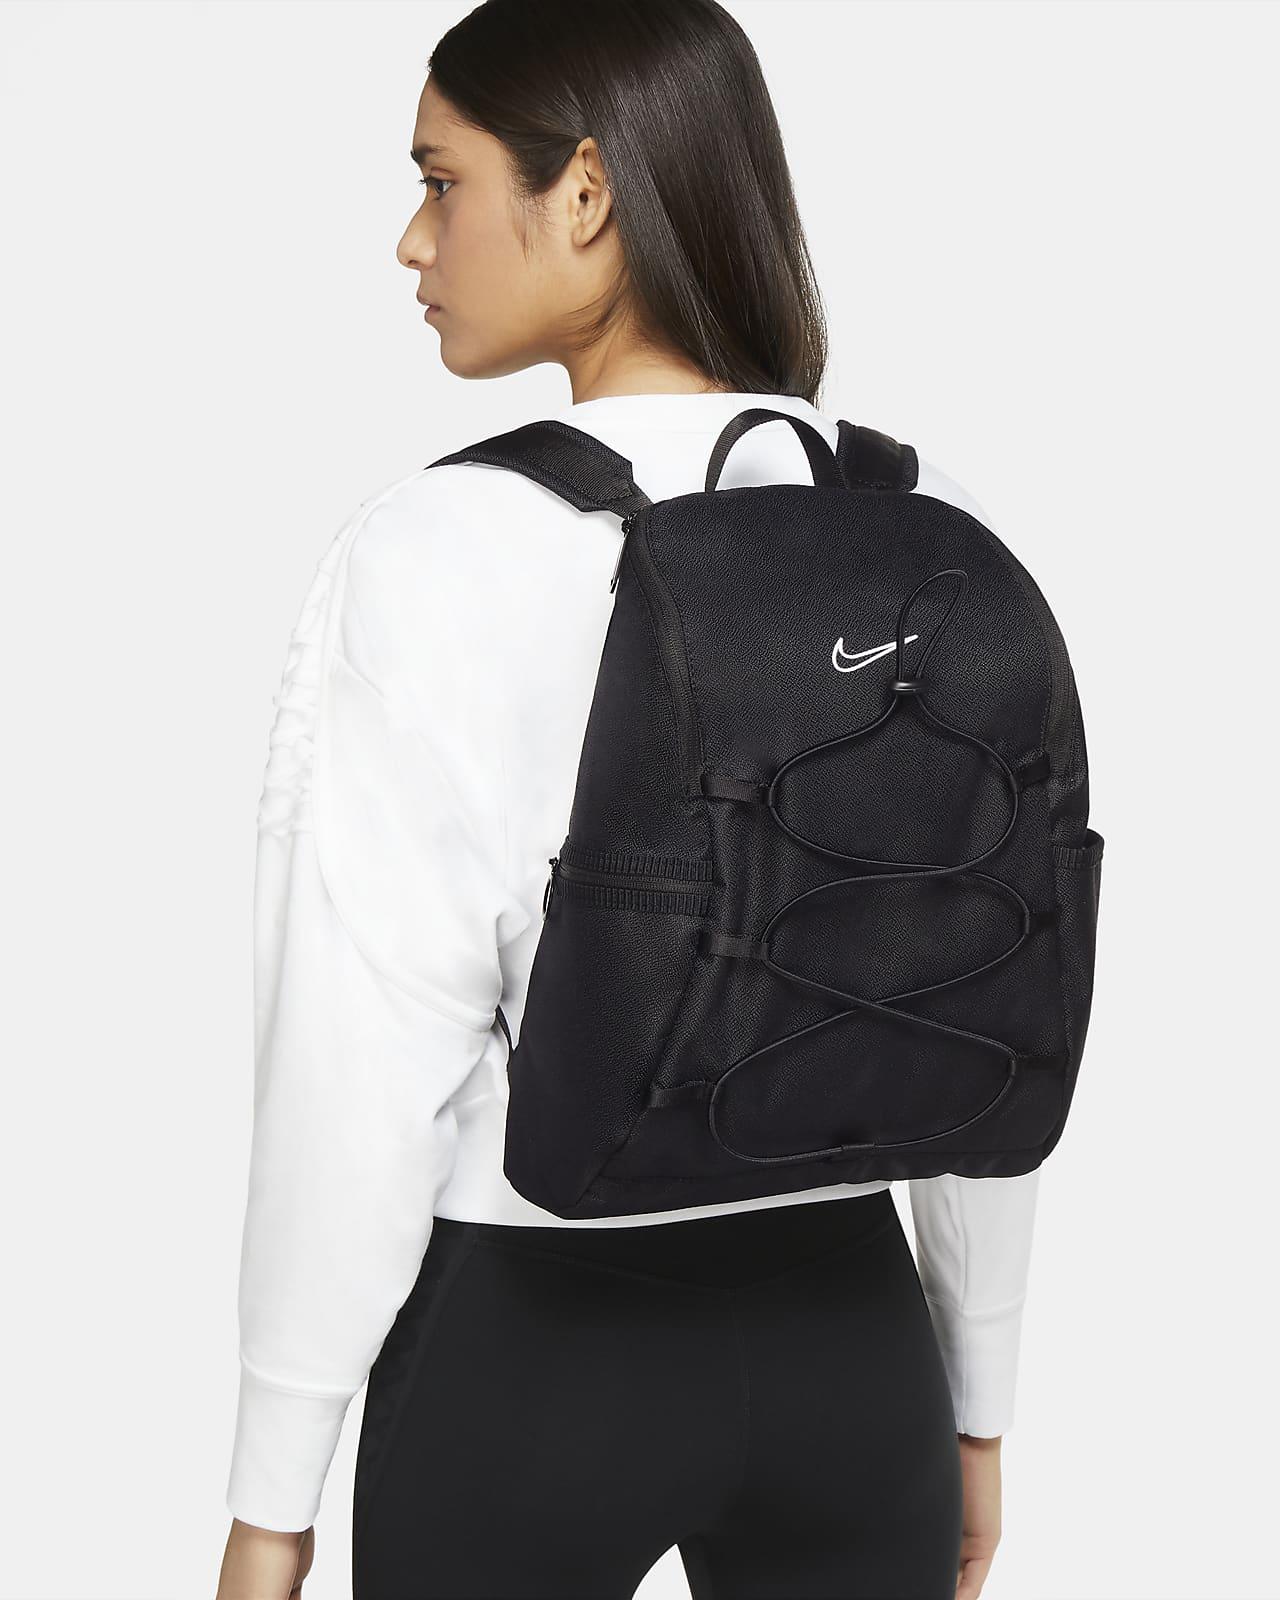 Nike One 女子训练双肩包